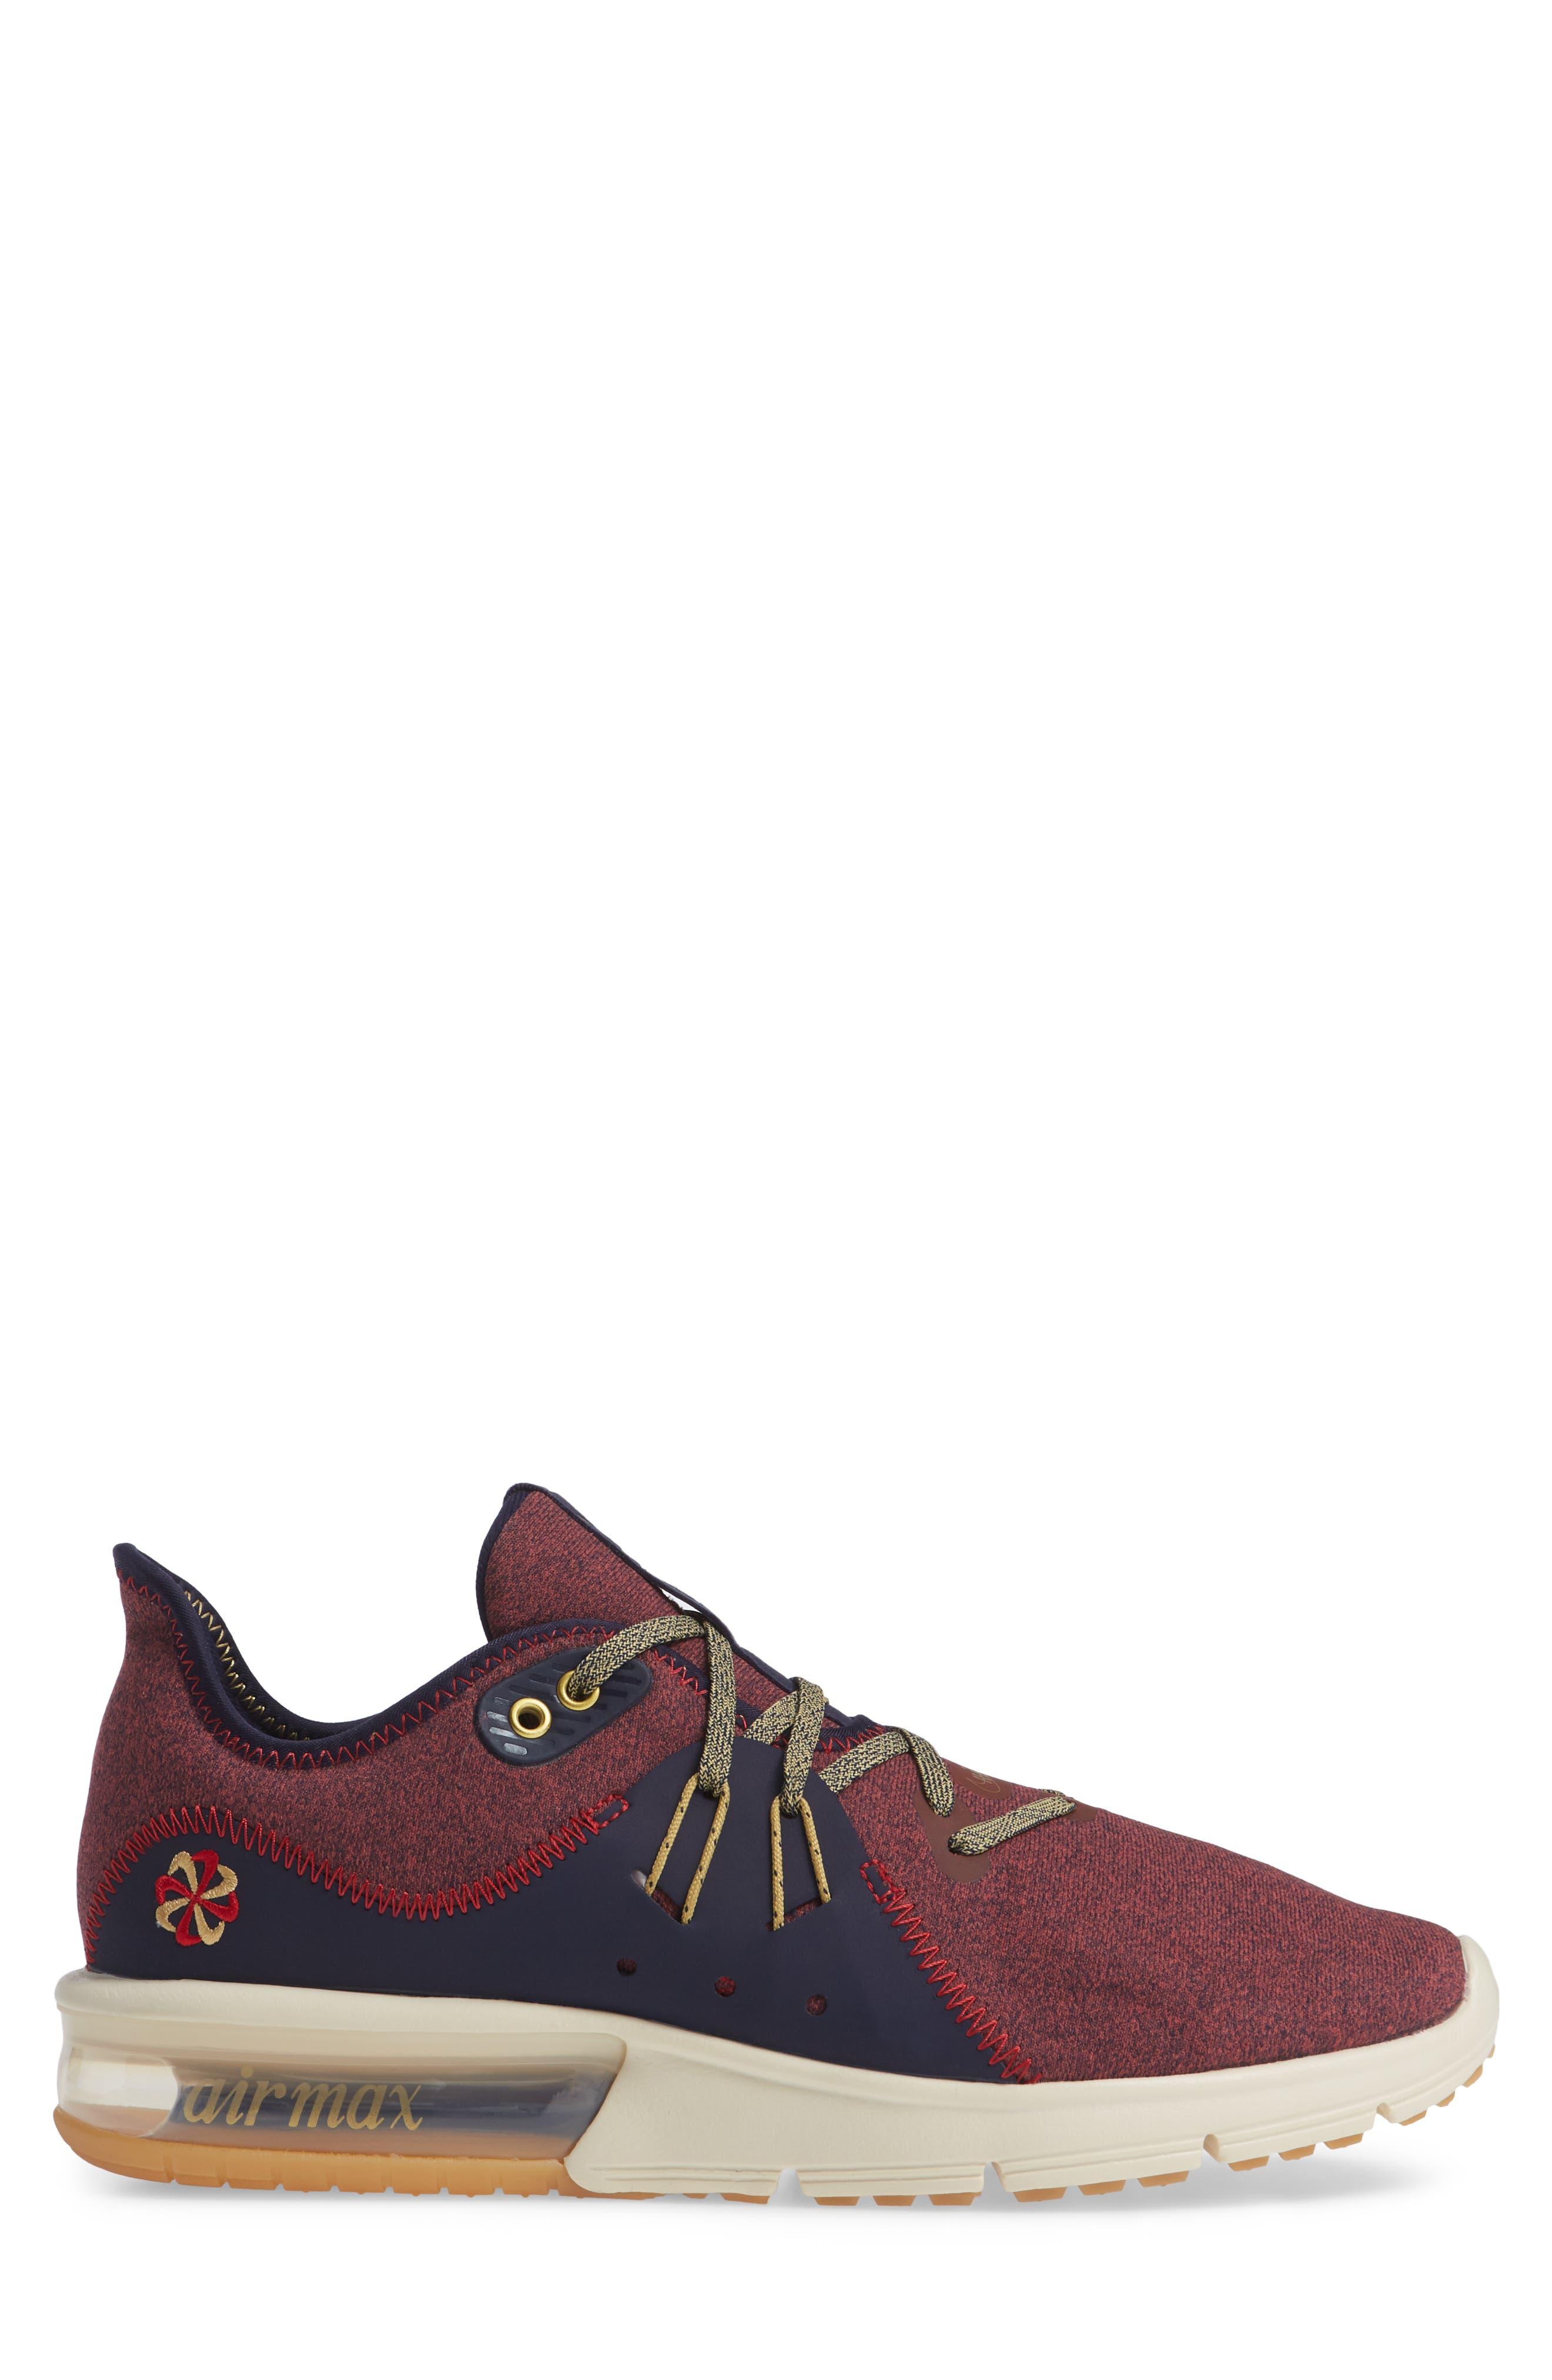 Air Max Sequent 3 PRM VST Sneaker,                             Alternate thumbnail 3, color,                             600